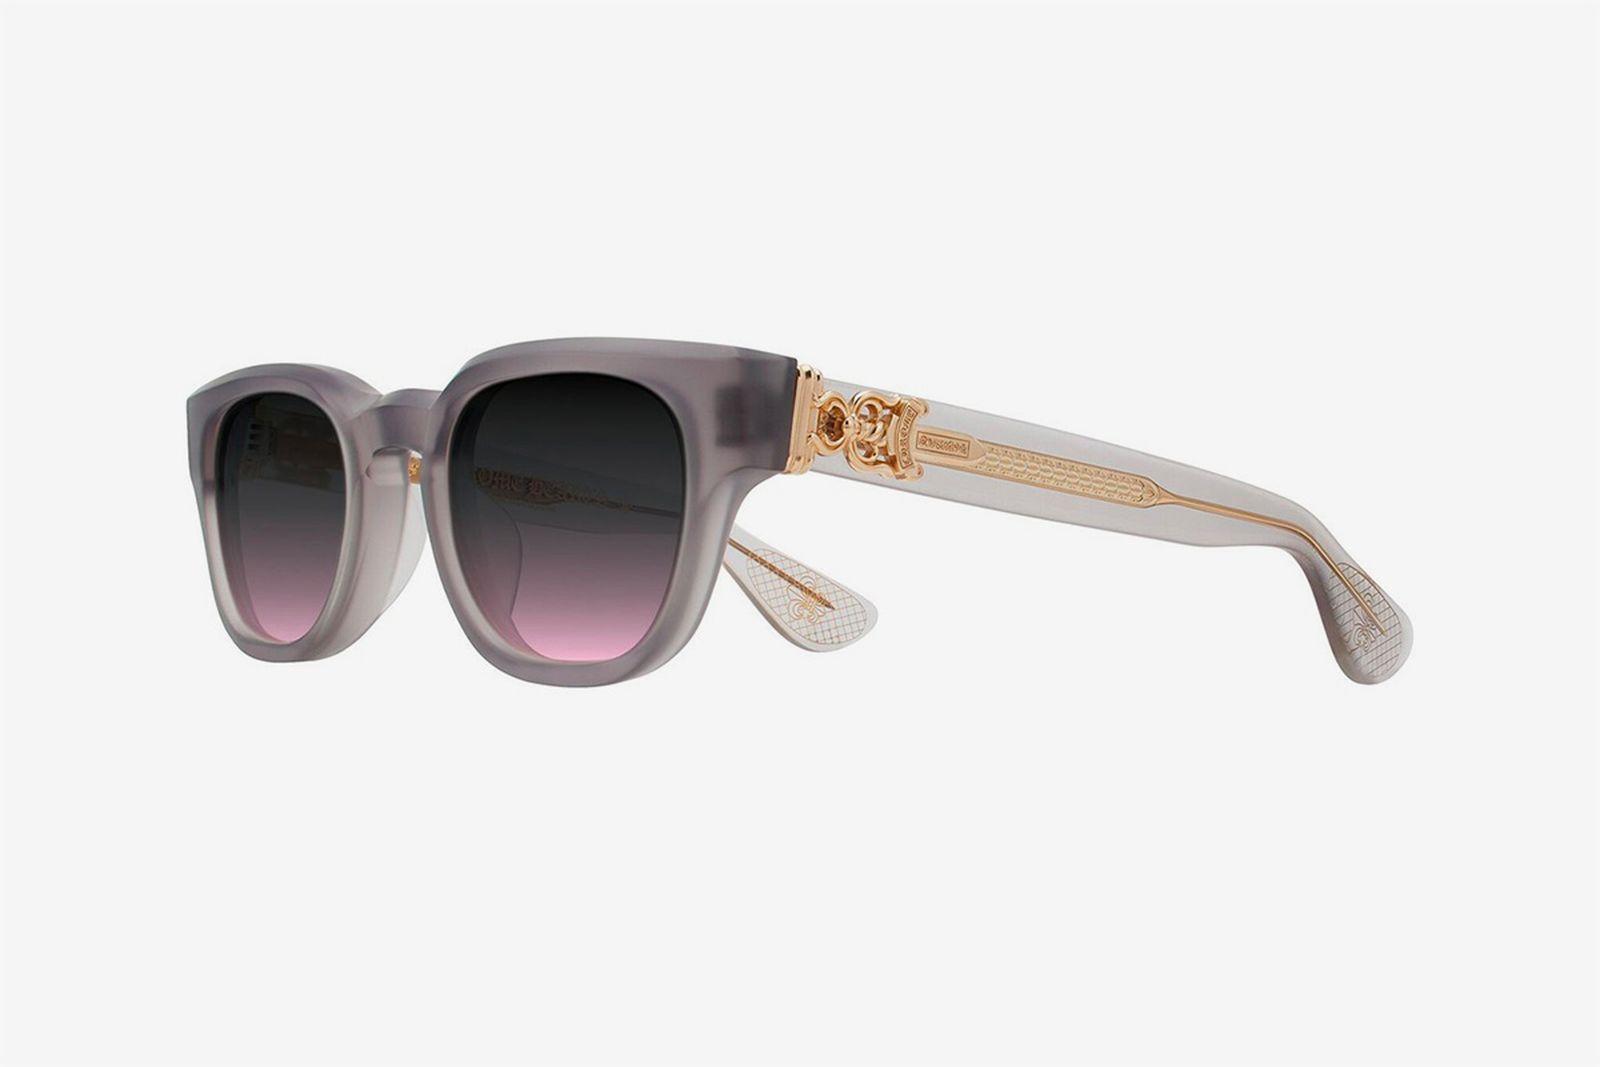 chrome hearts ss19 eyewear collection